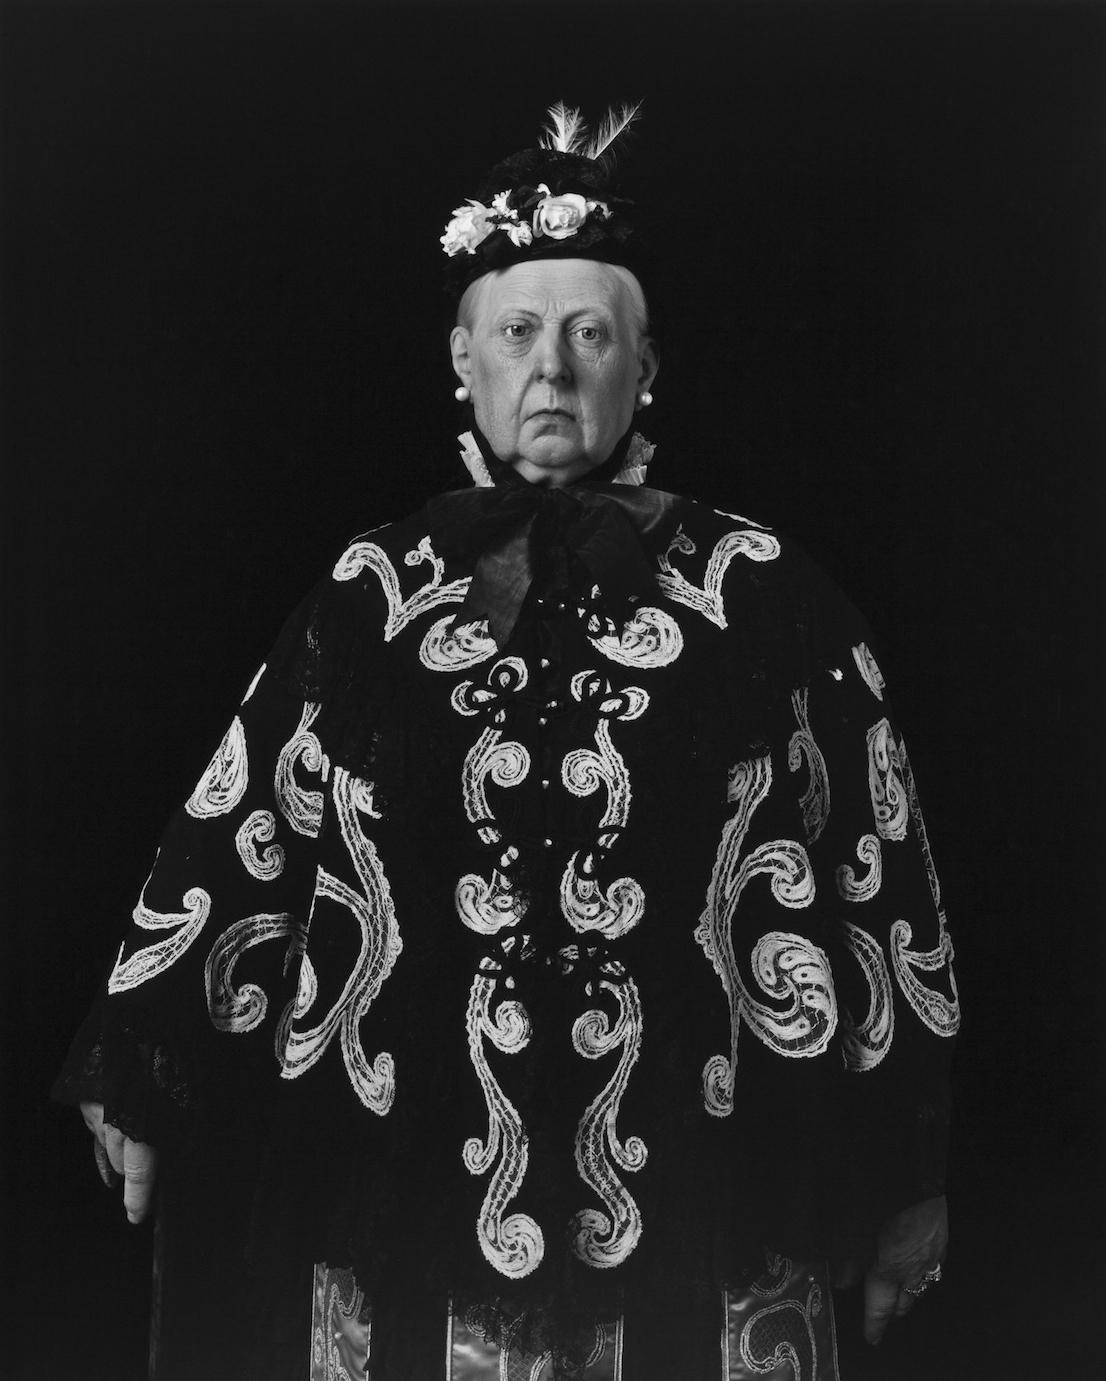 Hiroshi Sugimoto, Queen Victoria, 1999